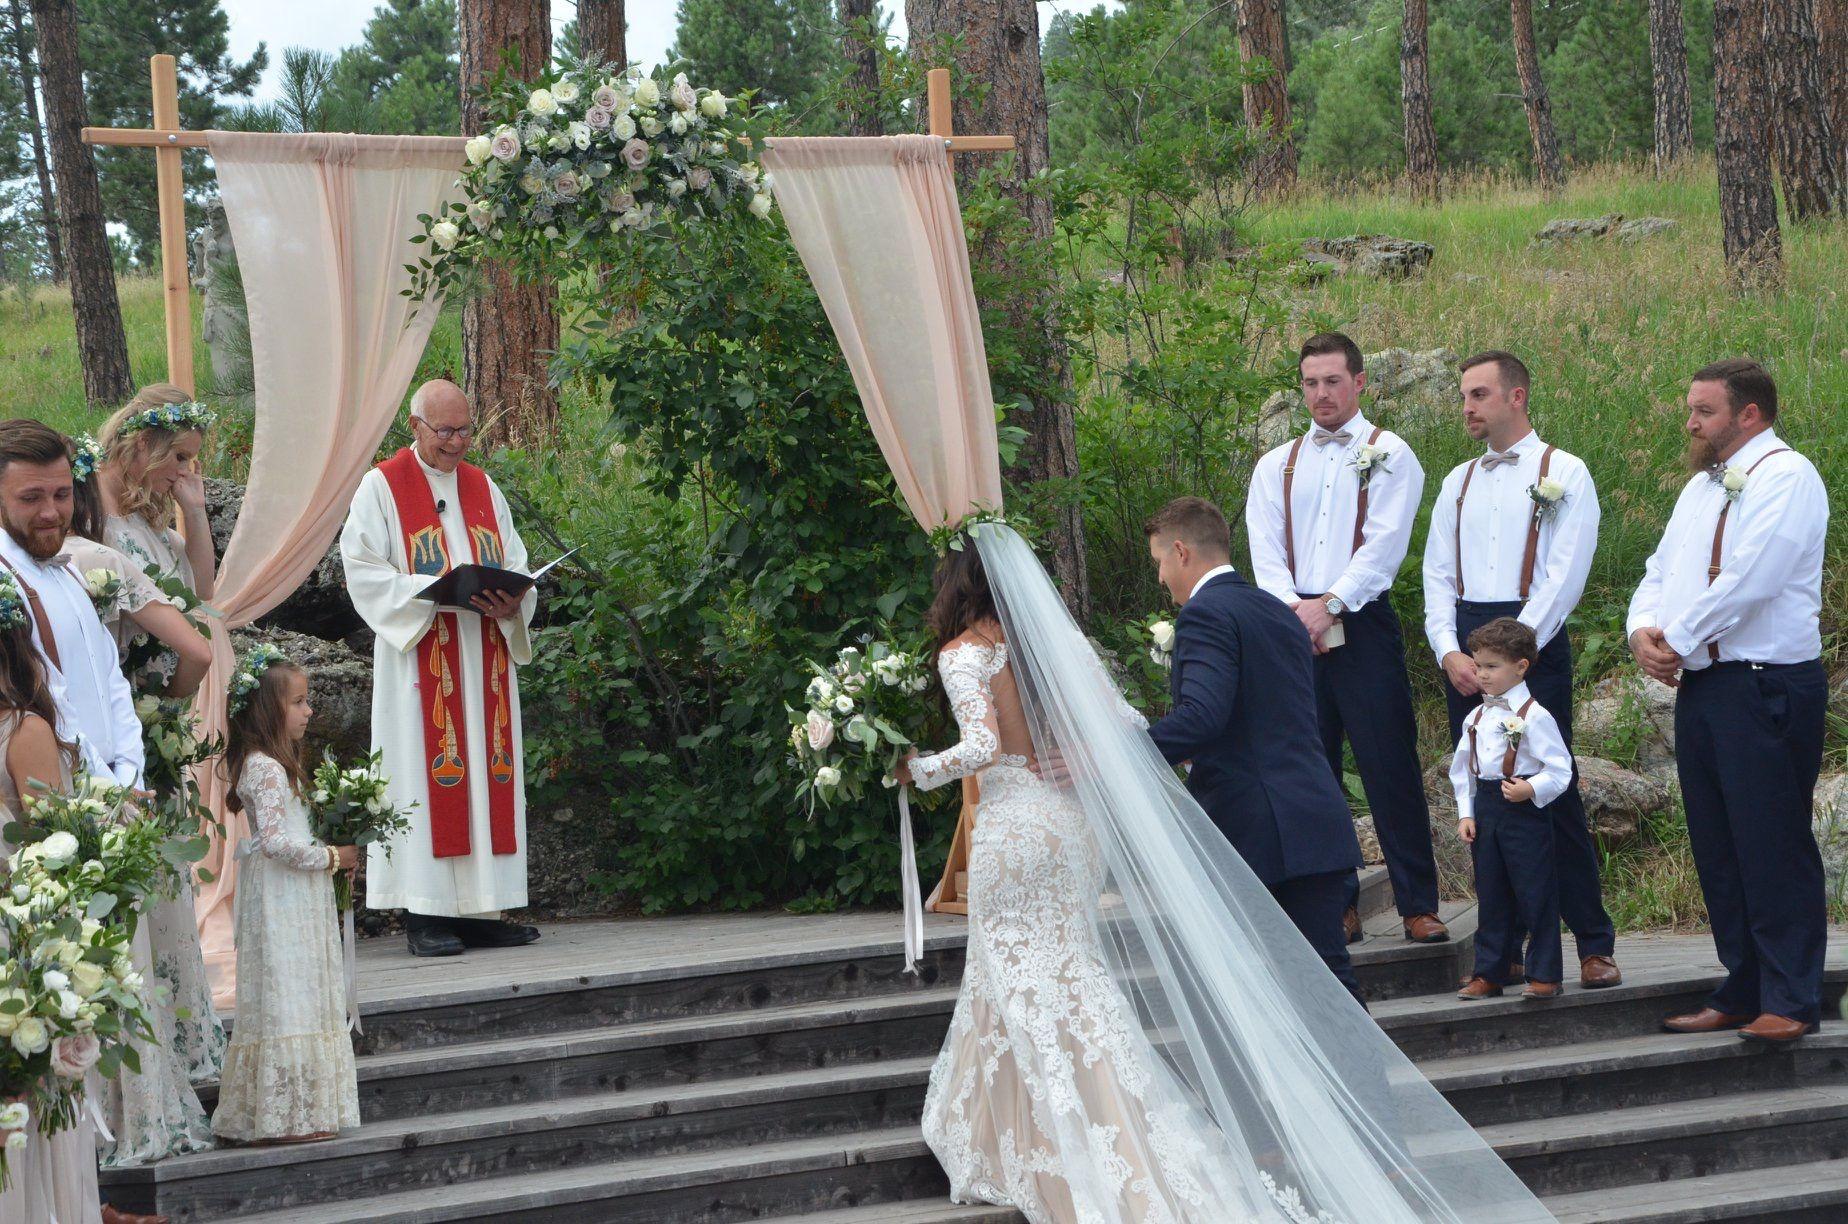 Brianna and Cody Destination wedding venues, Outdoor